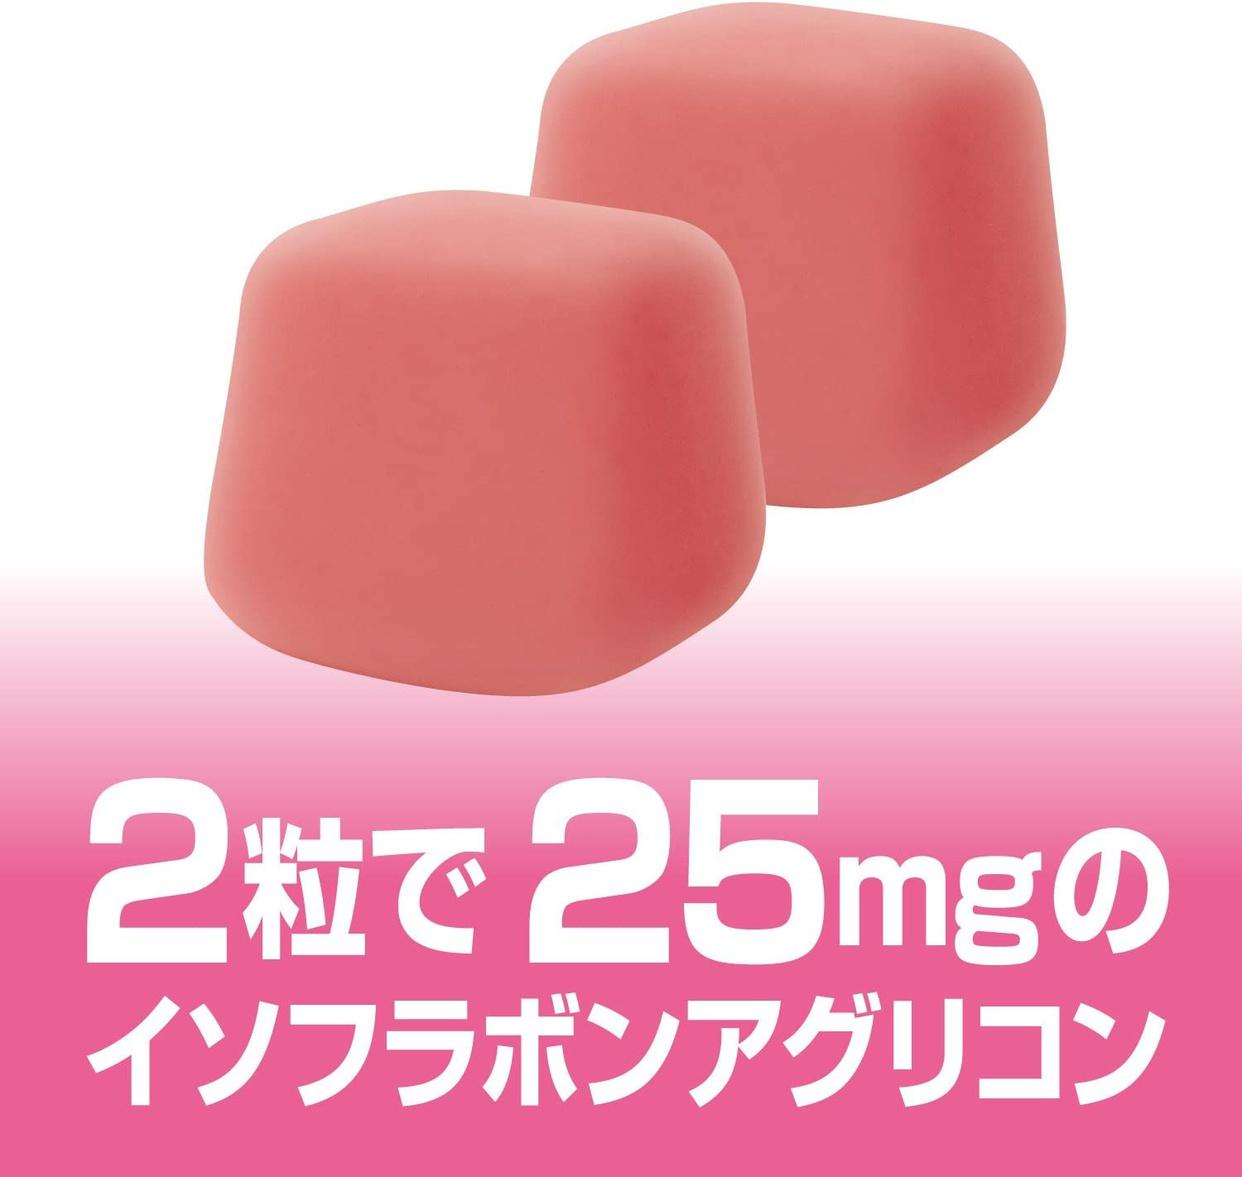 UHA味覚糖 グミサプリ 大豆イソフラボンの商品画像4